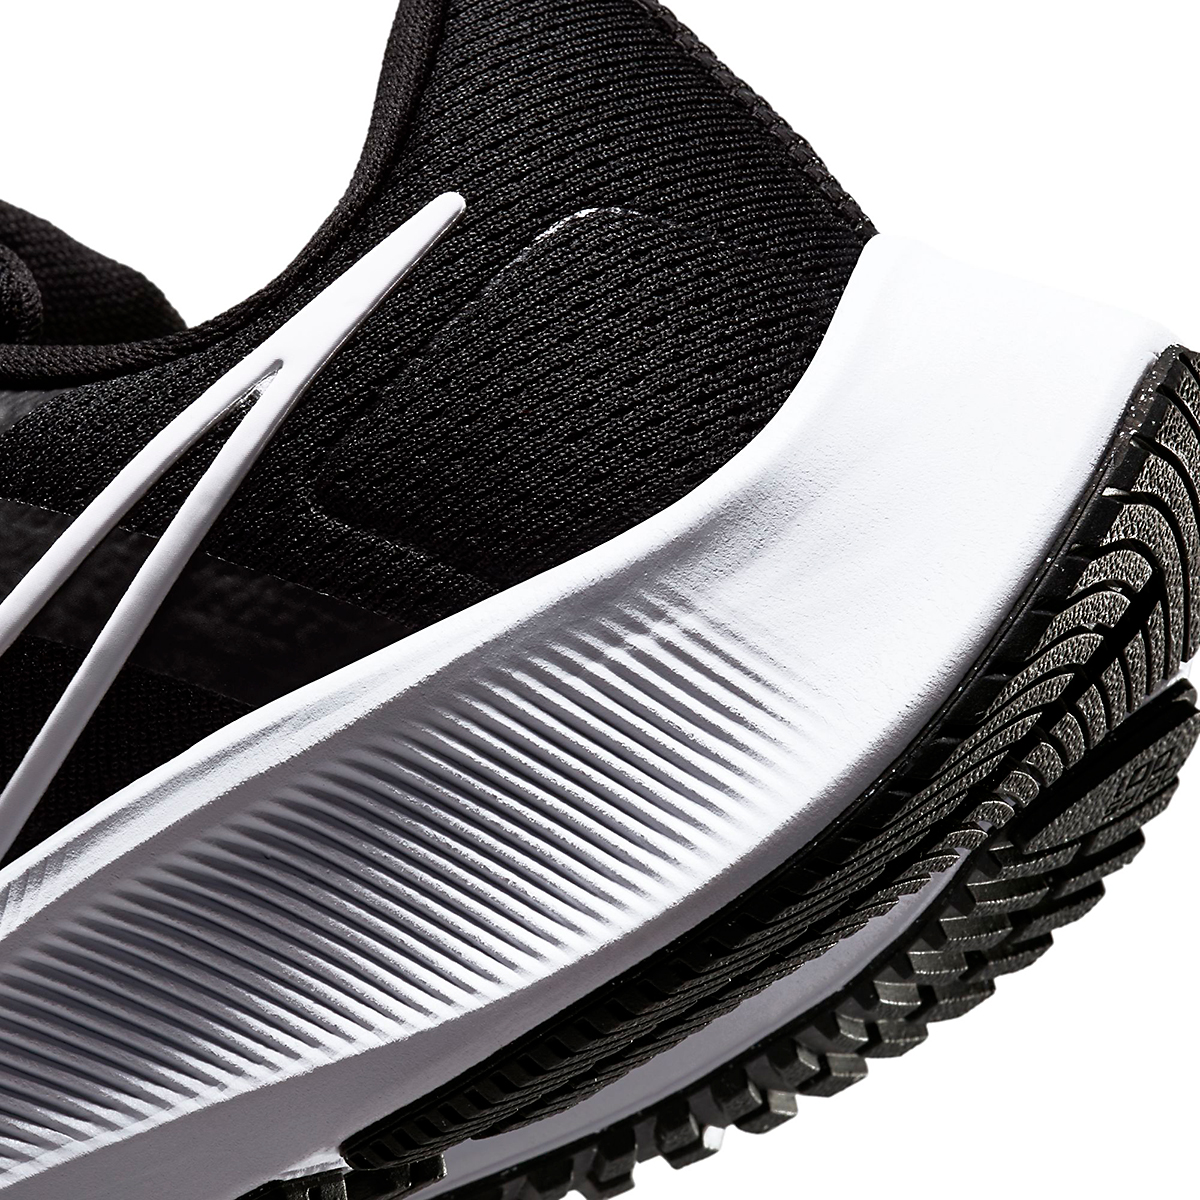 Women's Nike Air Zoom Pegasus 38 Running Shoe - Color: Black/White/Anthracite - Size: 5 - Width: Regular, Black/White/Anthracite, large, image 5